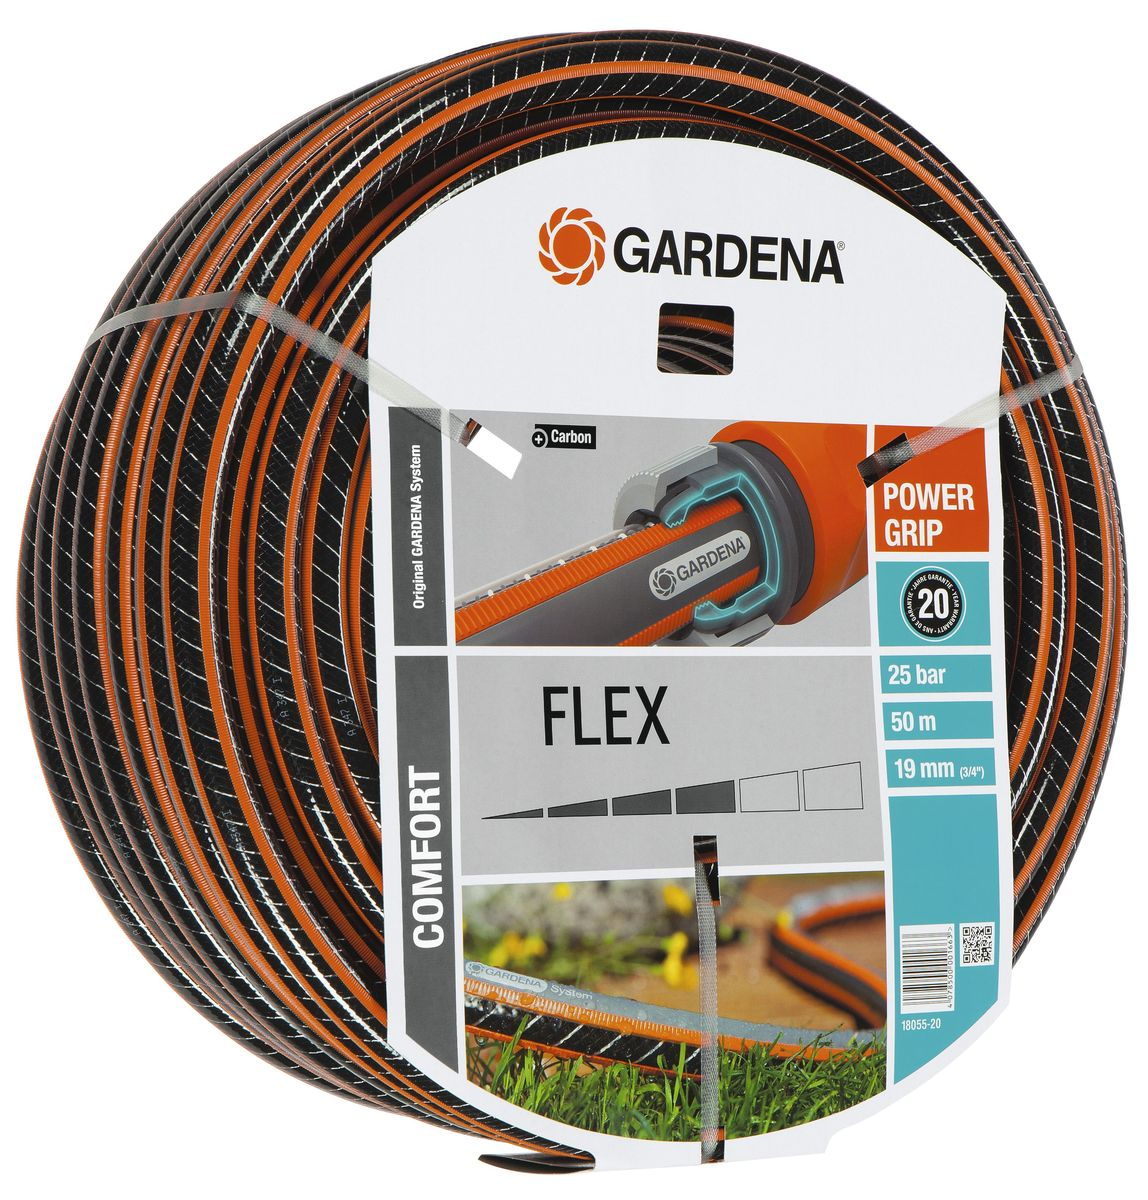 Шланг Gardena Flex, диаметр 3/4, длина 50 м шланг подающий gardena 25 мм х 25 м 02792 20